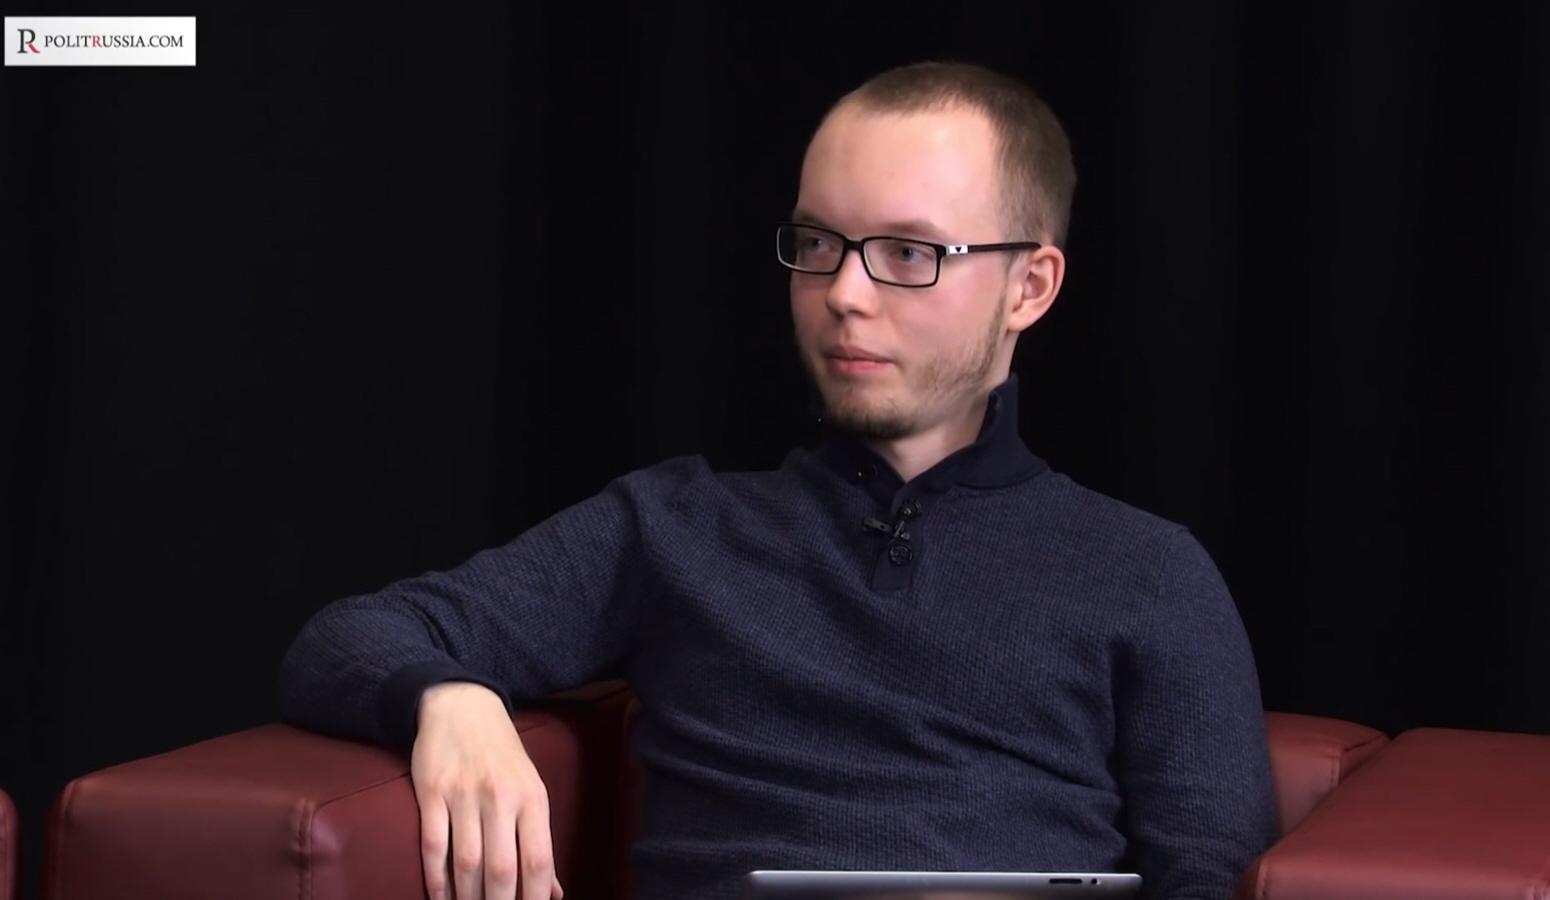 Глеб Медведев - редактор издания Politrussia